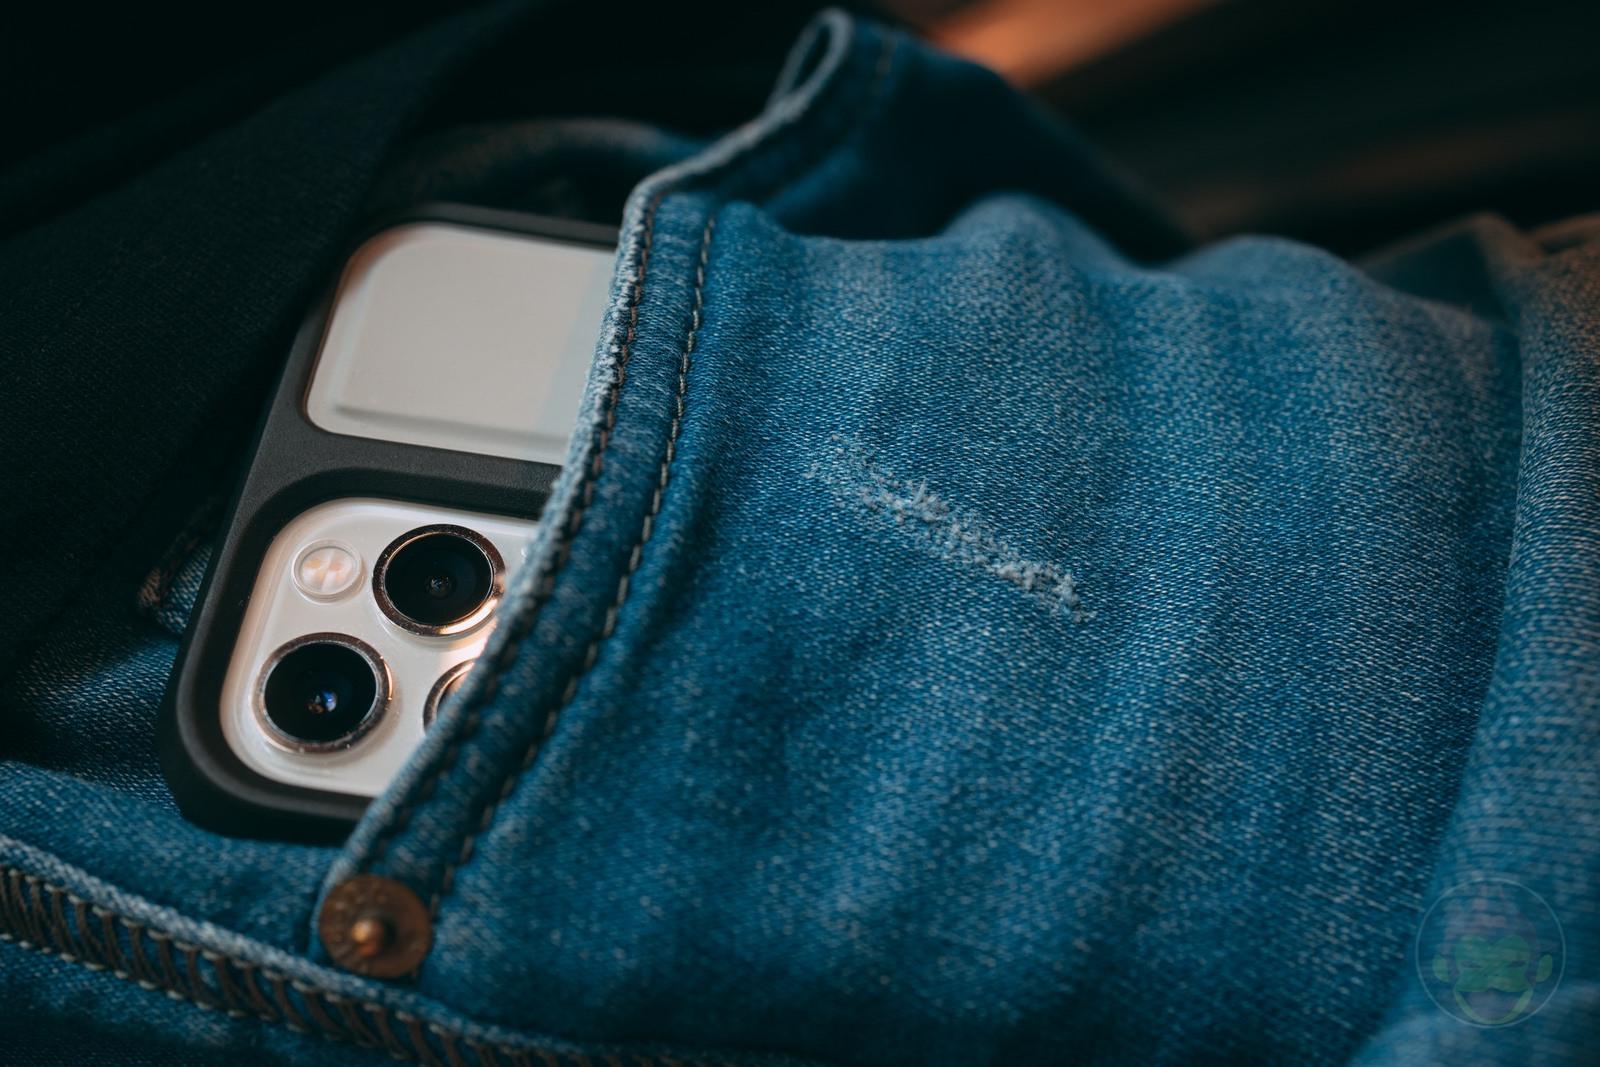 iphone12pro-tethering-comparison-04.jpg